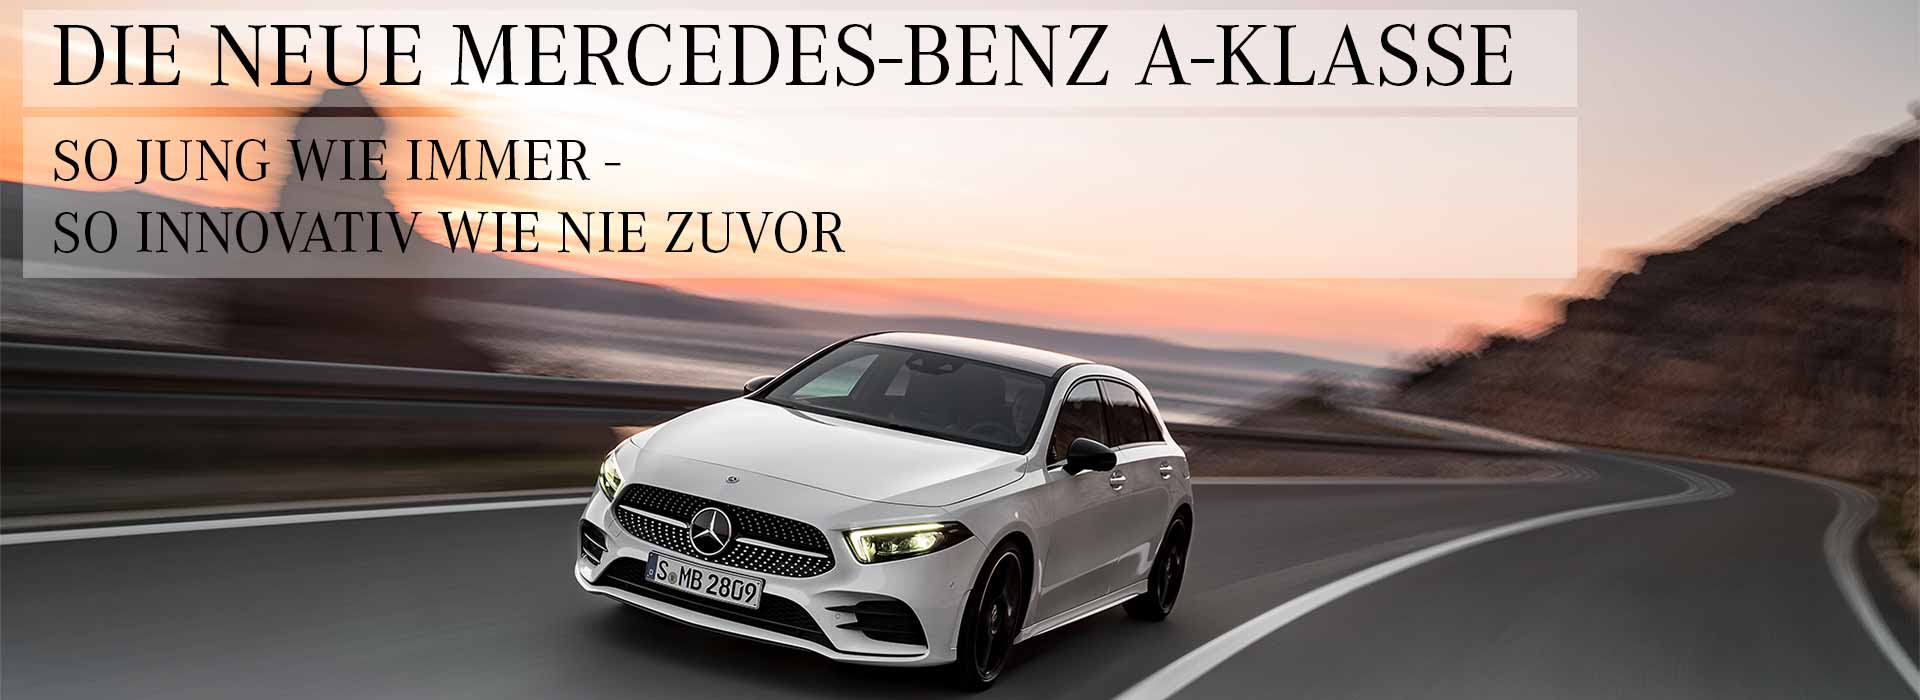 Die neue Mercedes Benz A-Klasse